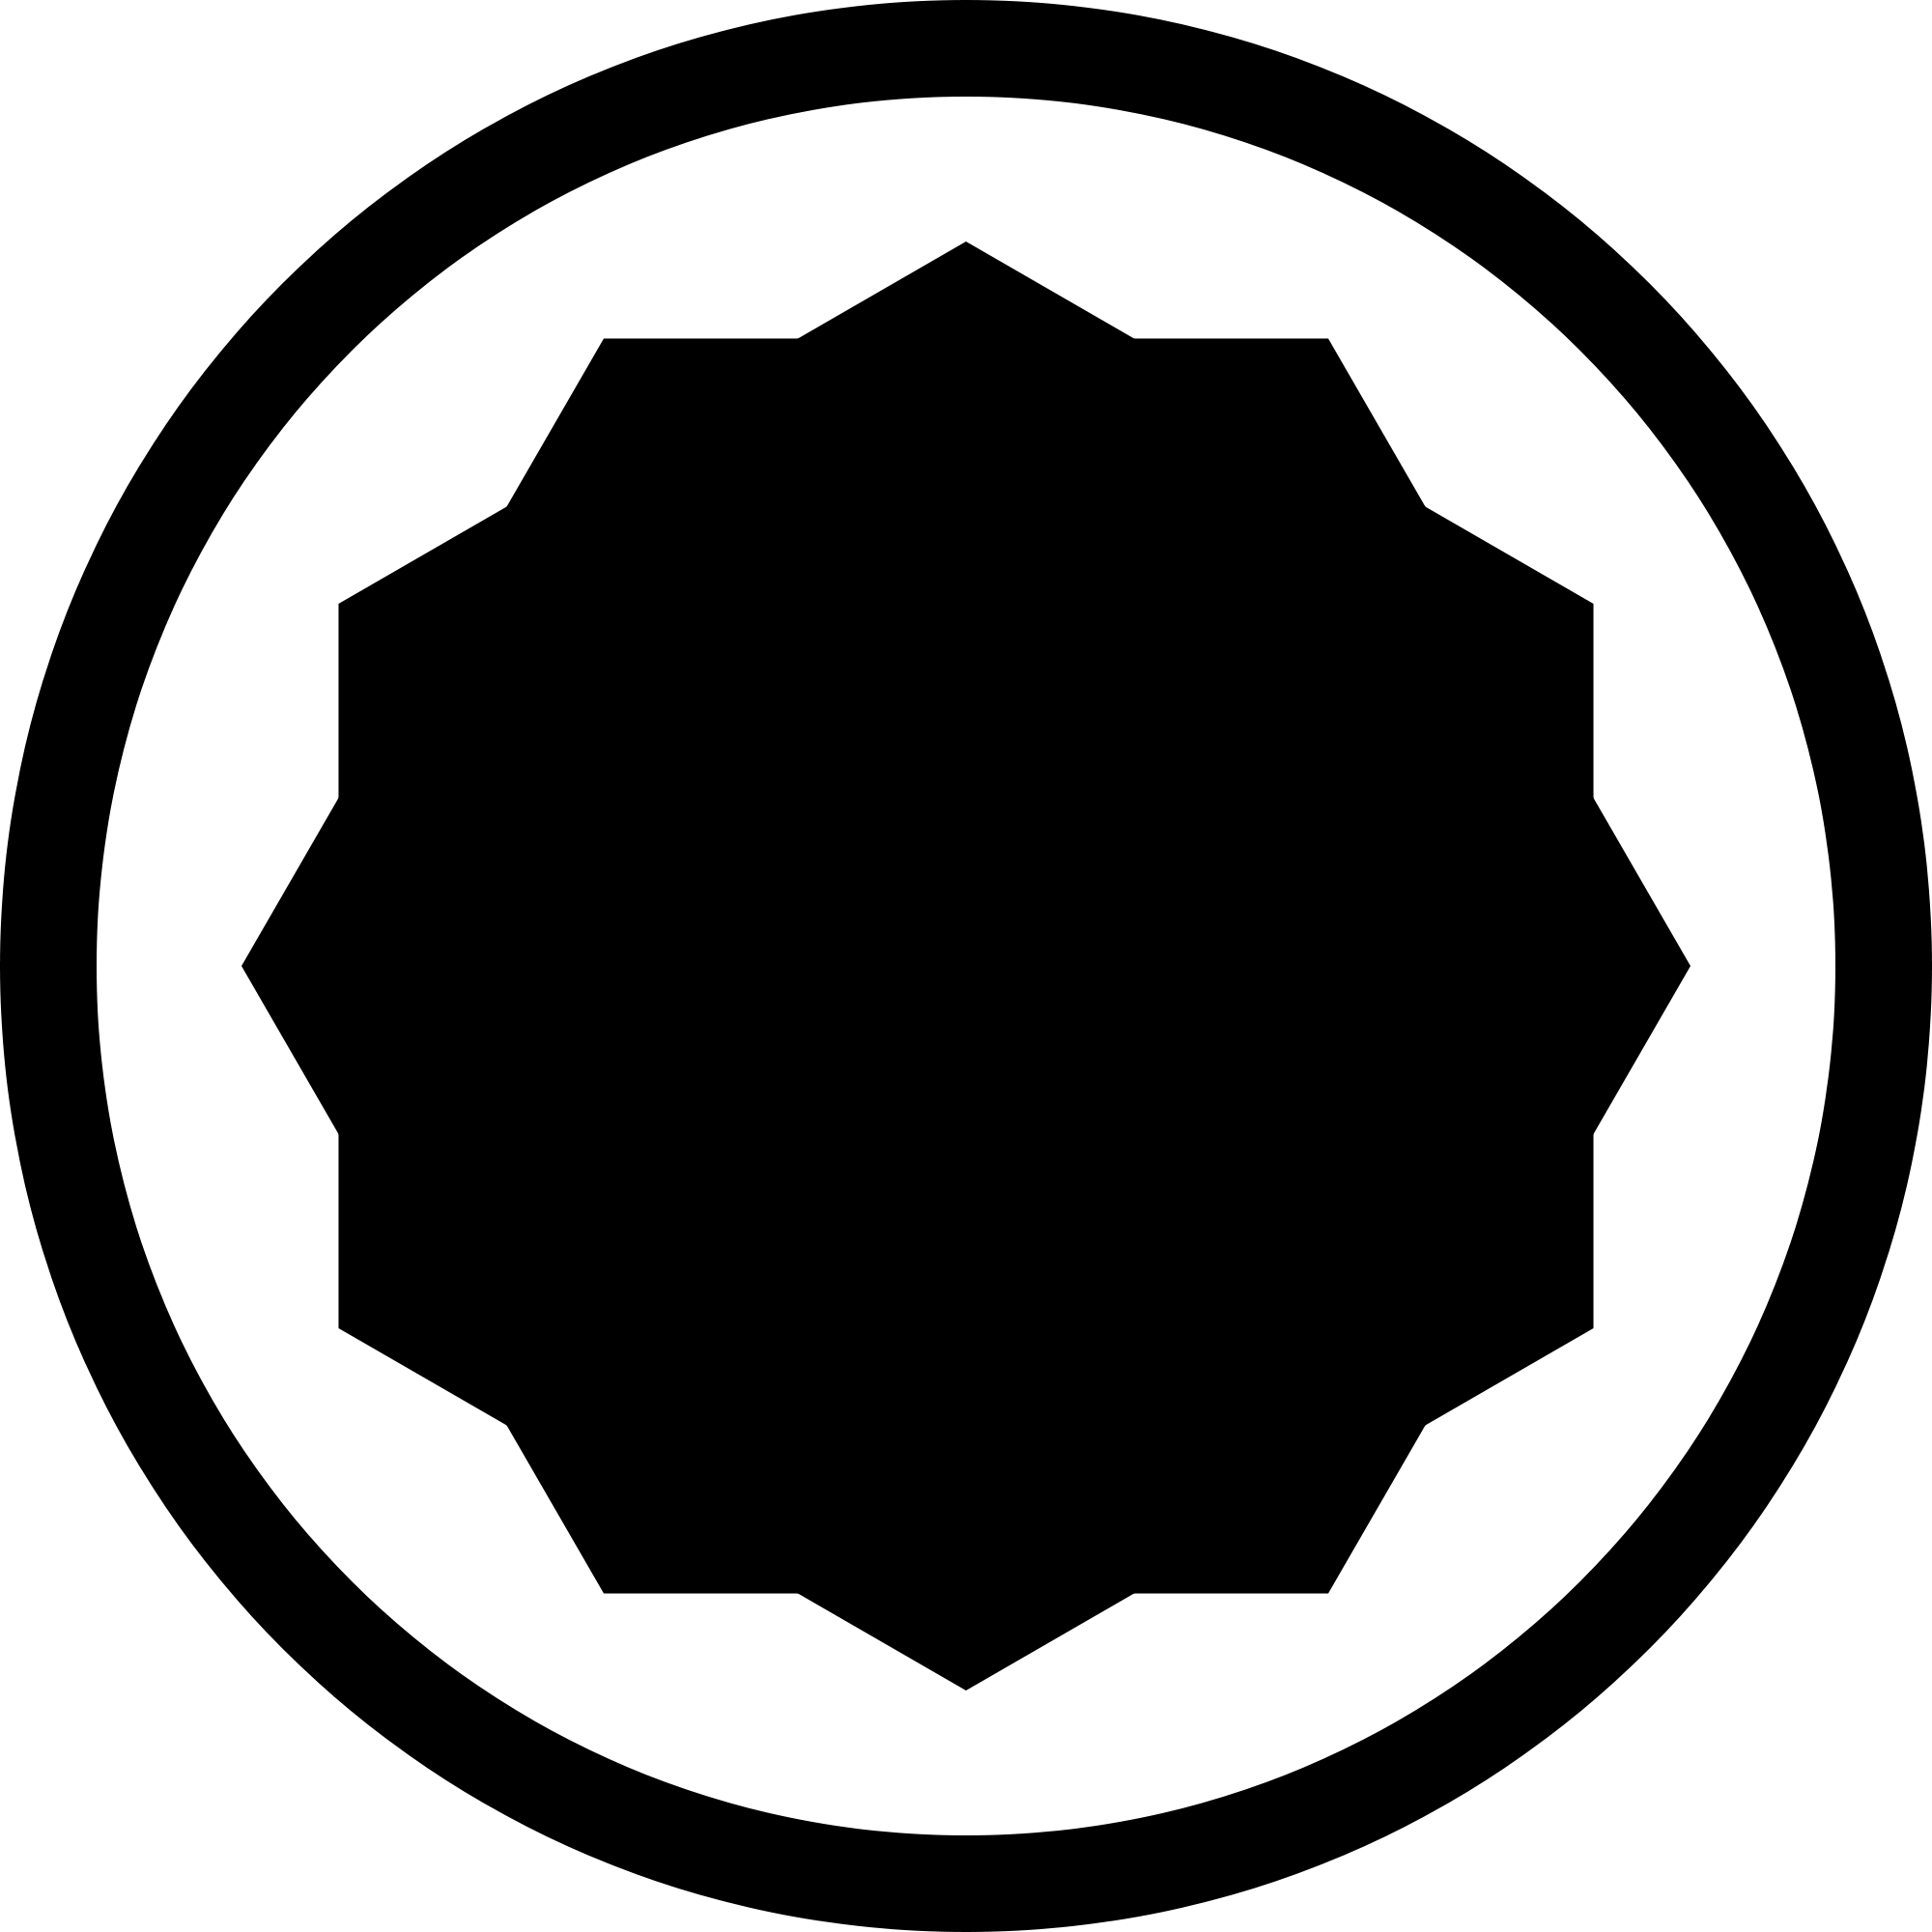 Screws clipart torx Wikimedia svg Commons Double Head